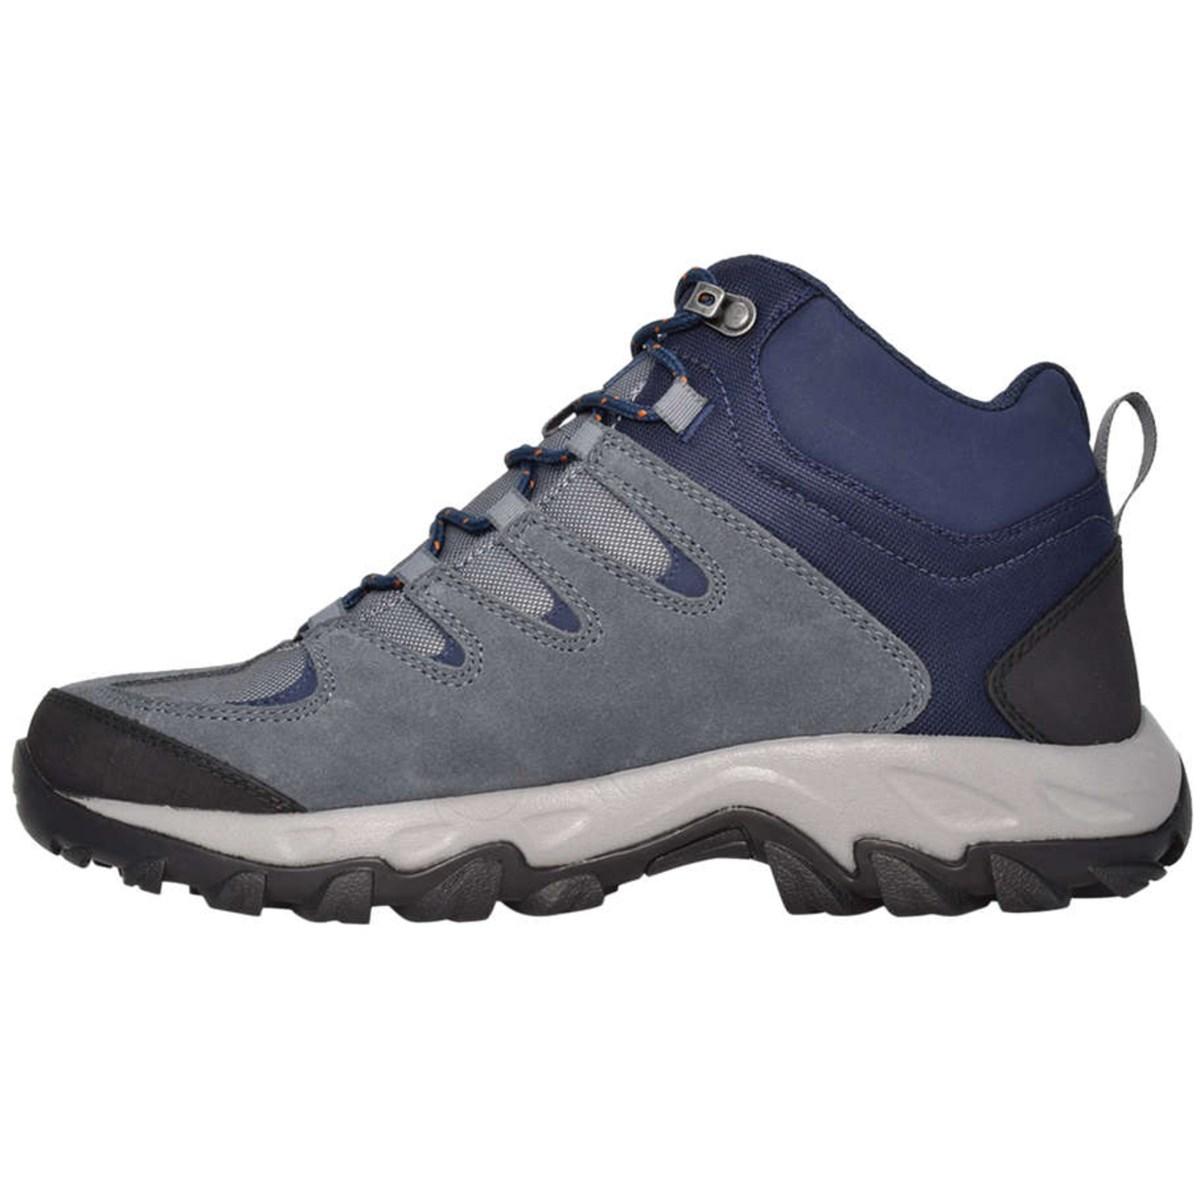 Bm5527 Buxton Peak Mavi Outdoor Ayakkabı